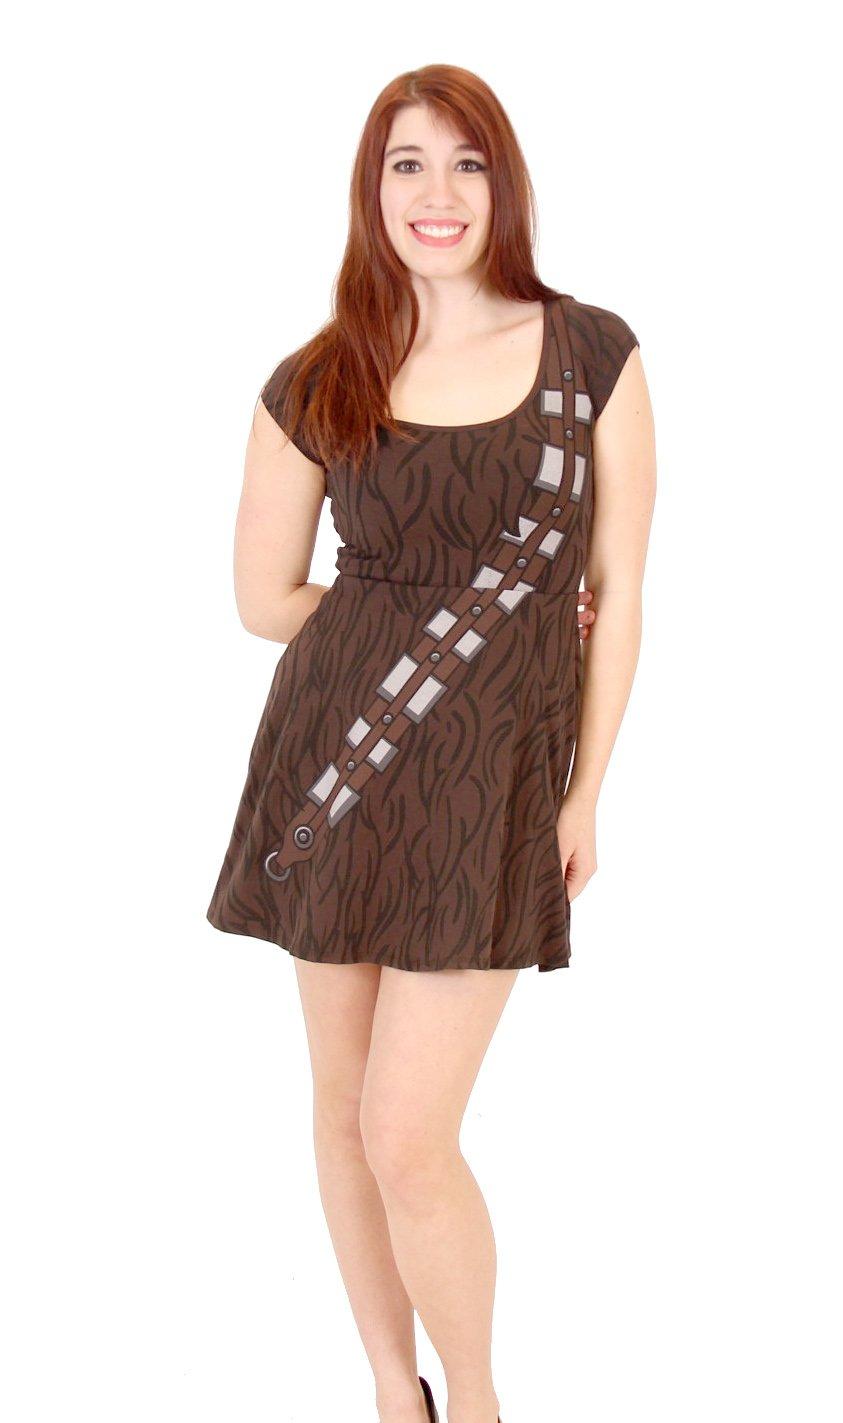 Star Wars Chewbacca Skater Dress - XL